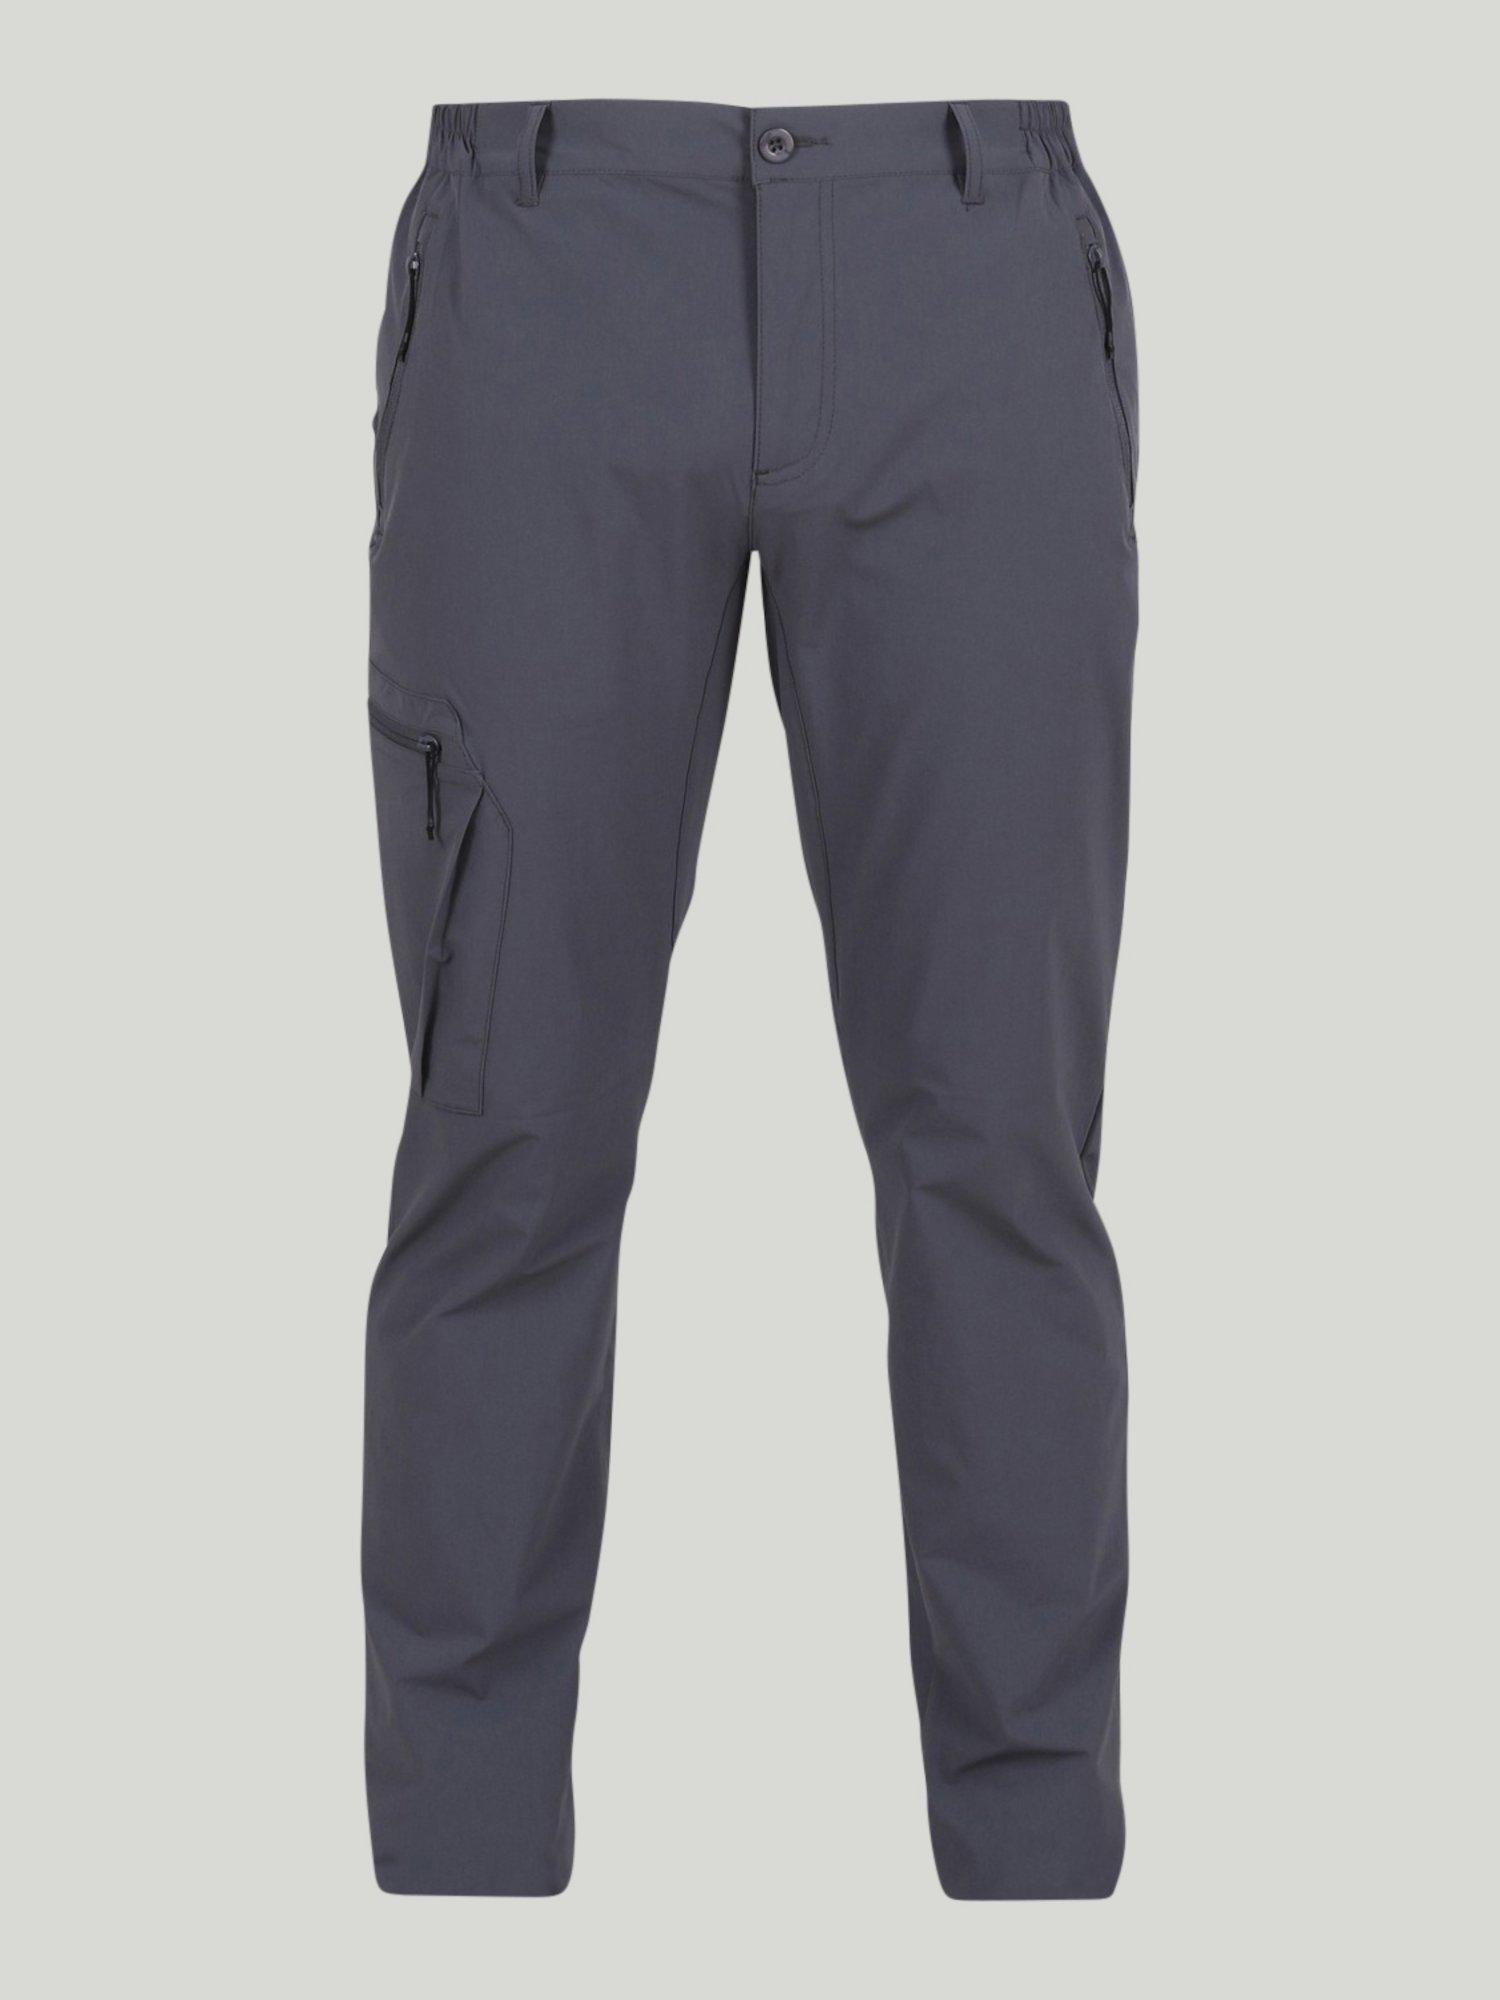 Trousers Cala Gonone - Anthrazit